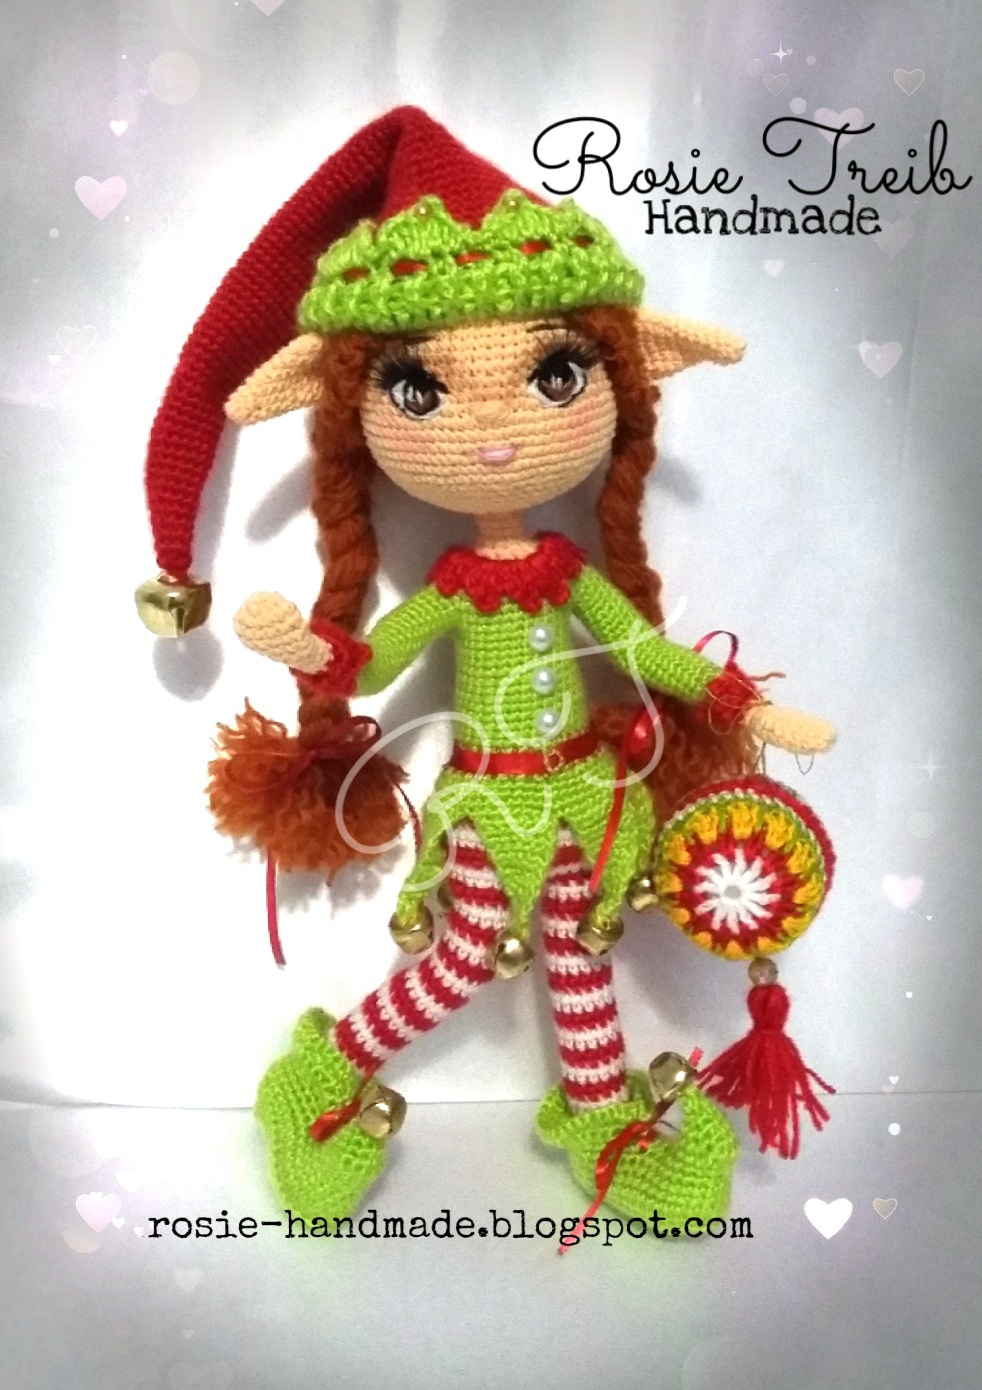 Crochet Christmas Elves Amigurumi Free Pattern - #Amigurumi; #Elf ... | 1390x982